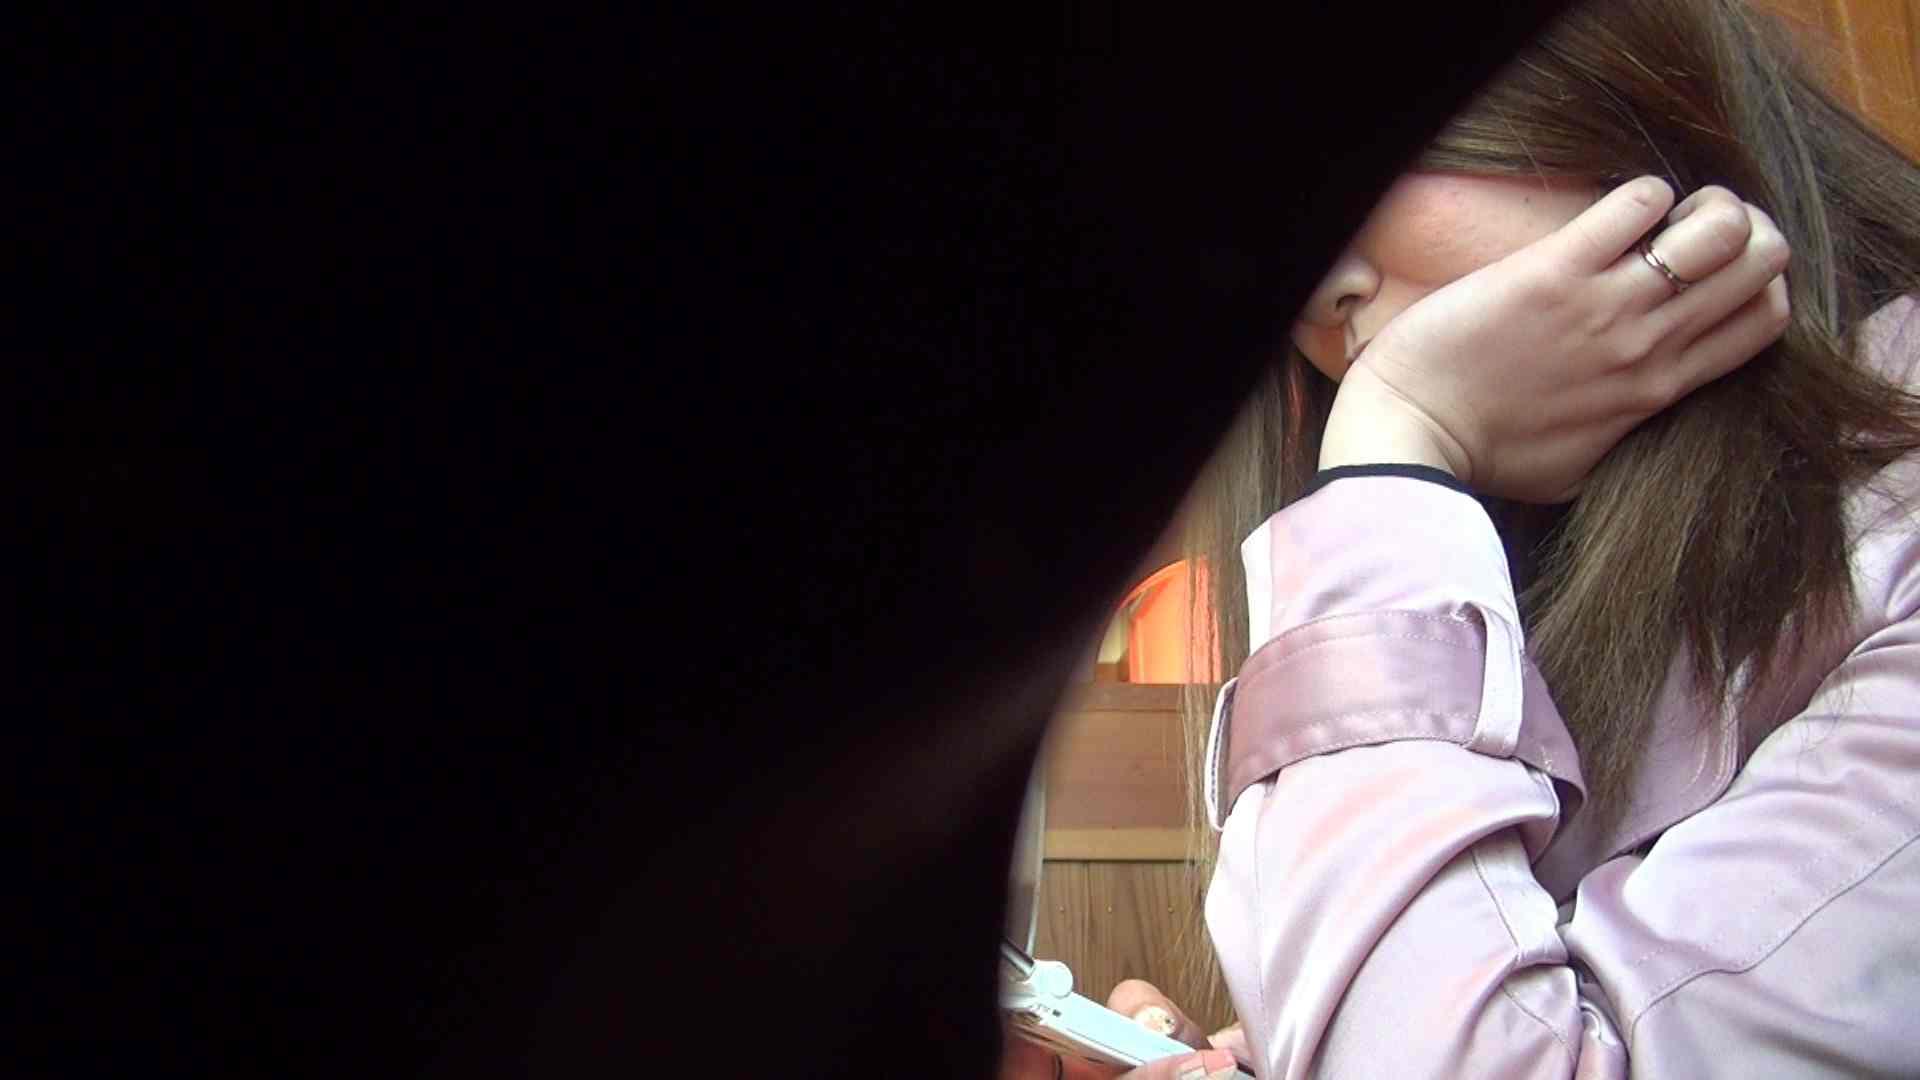 episode1 ヒロトさんと保険外交員との顔合わせ おまんこ無修正 オメコ動画キャプチャ 71pic 69